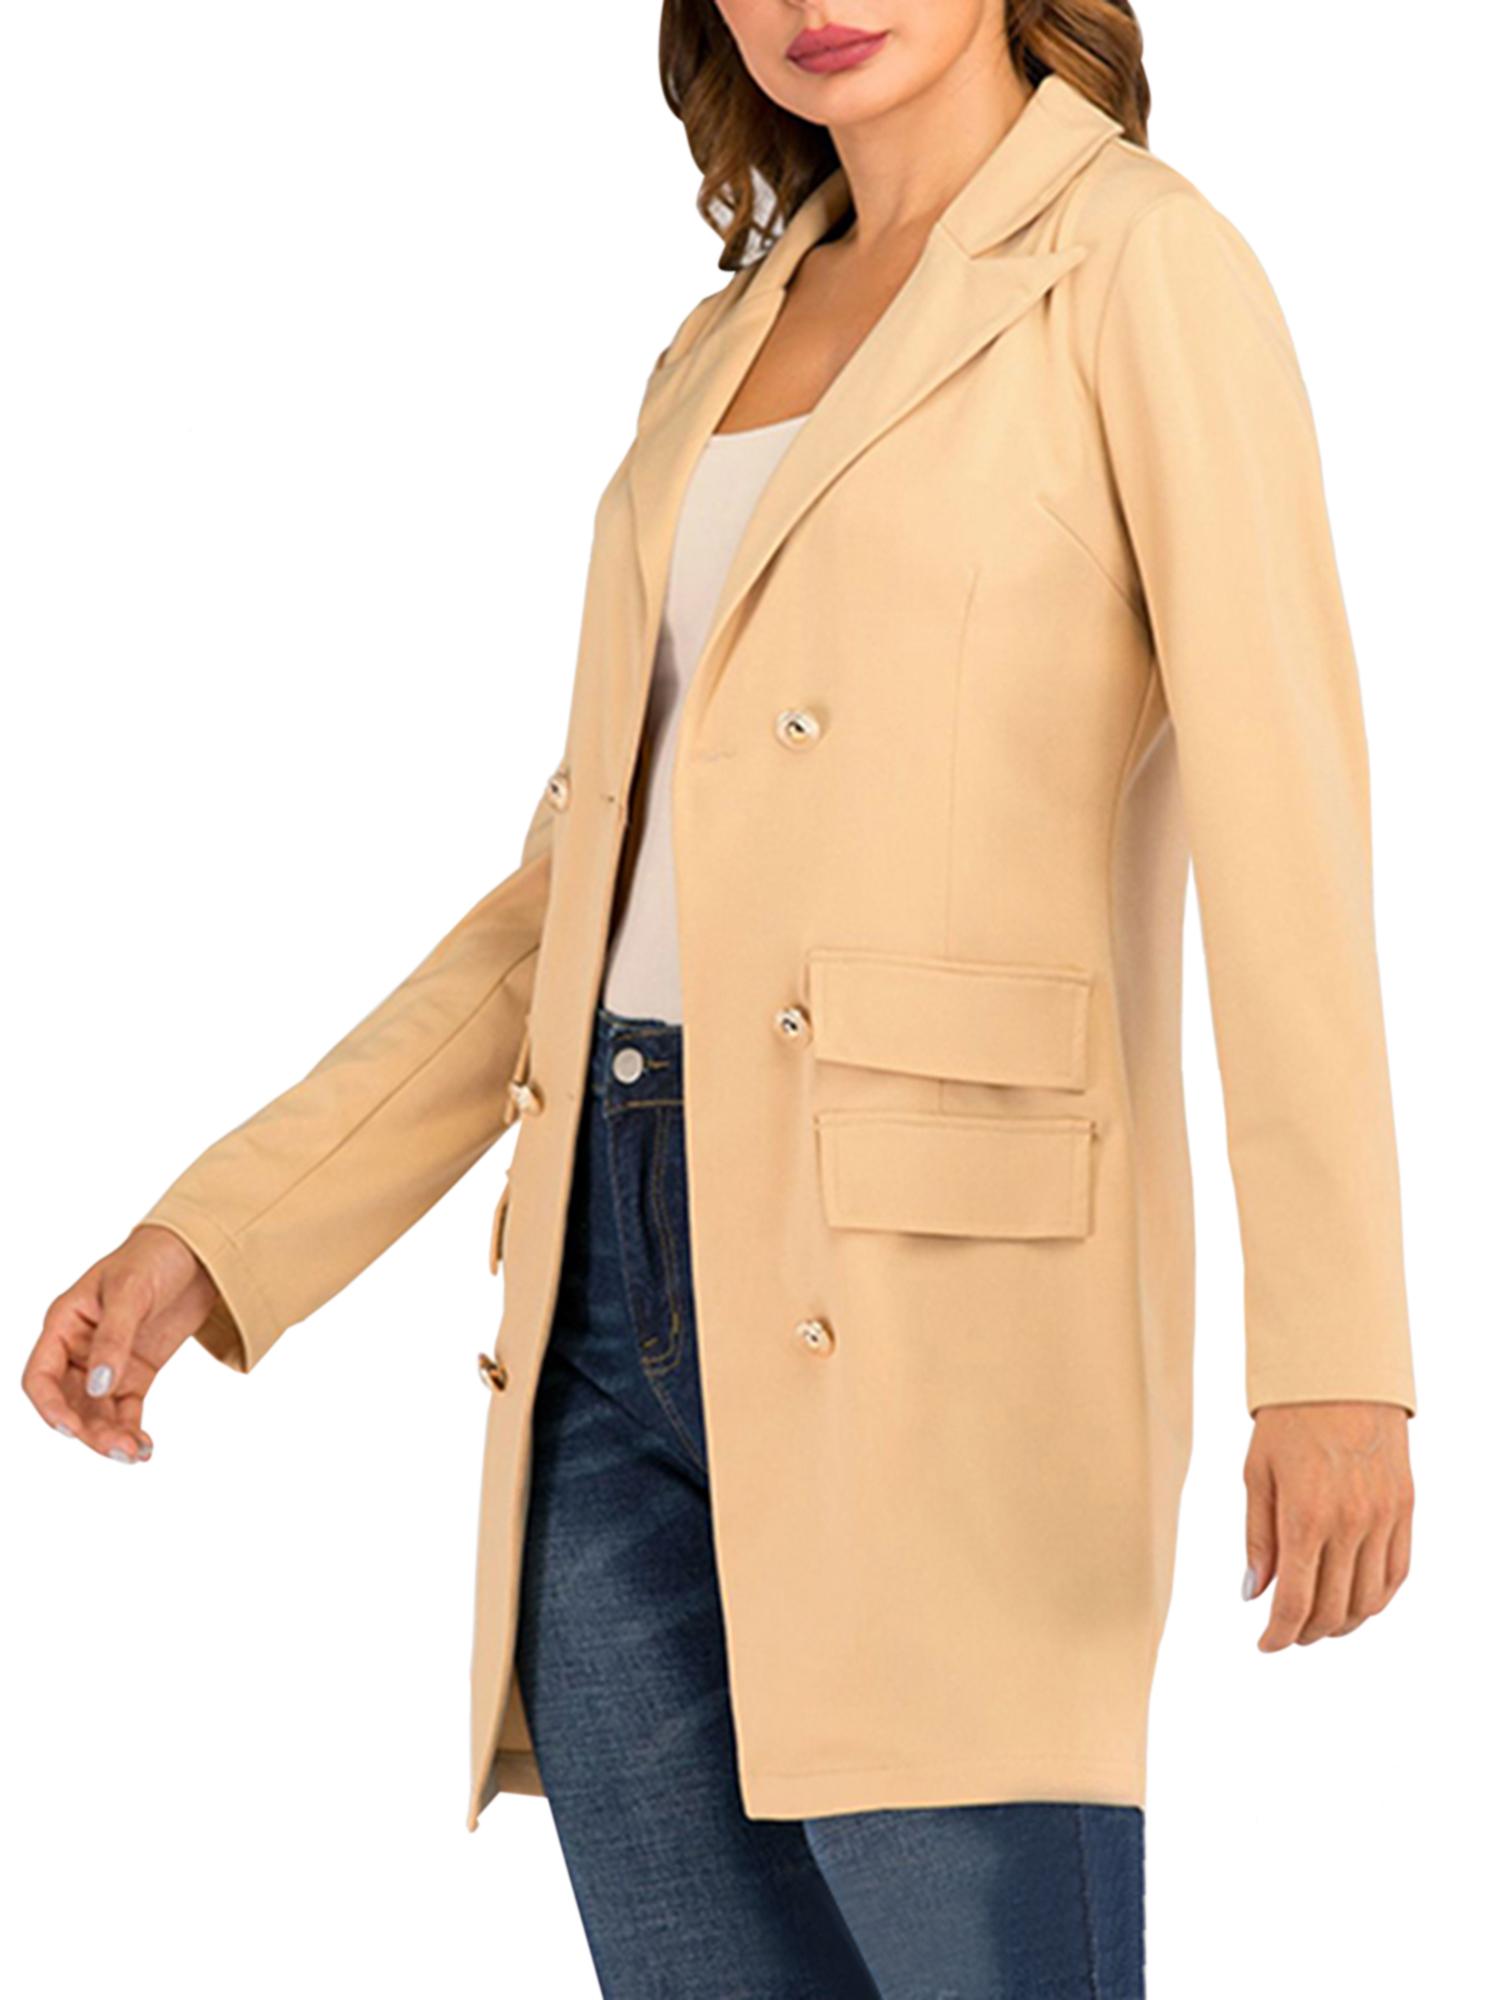 Vintage-Women-Double-Breasted-Plaid-Long-Blazer-Ladies-Jackets-Suits-Coat-Pocket miniatura 39